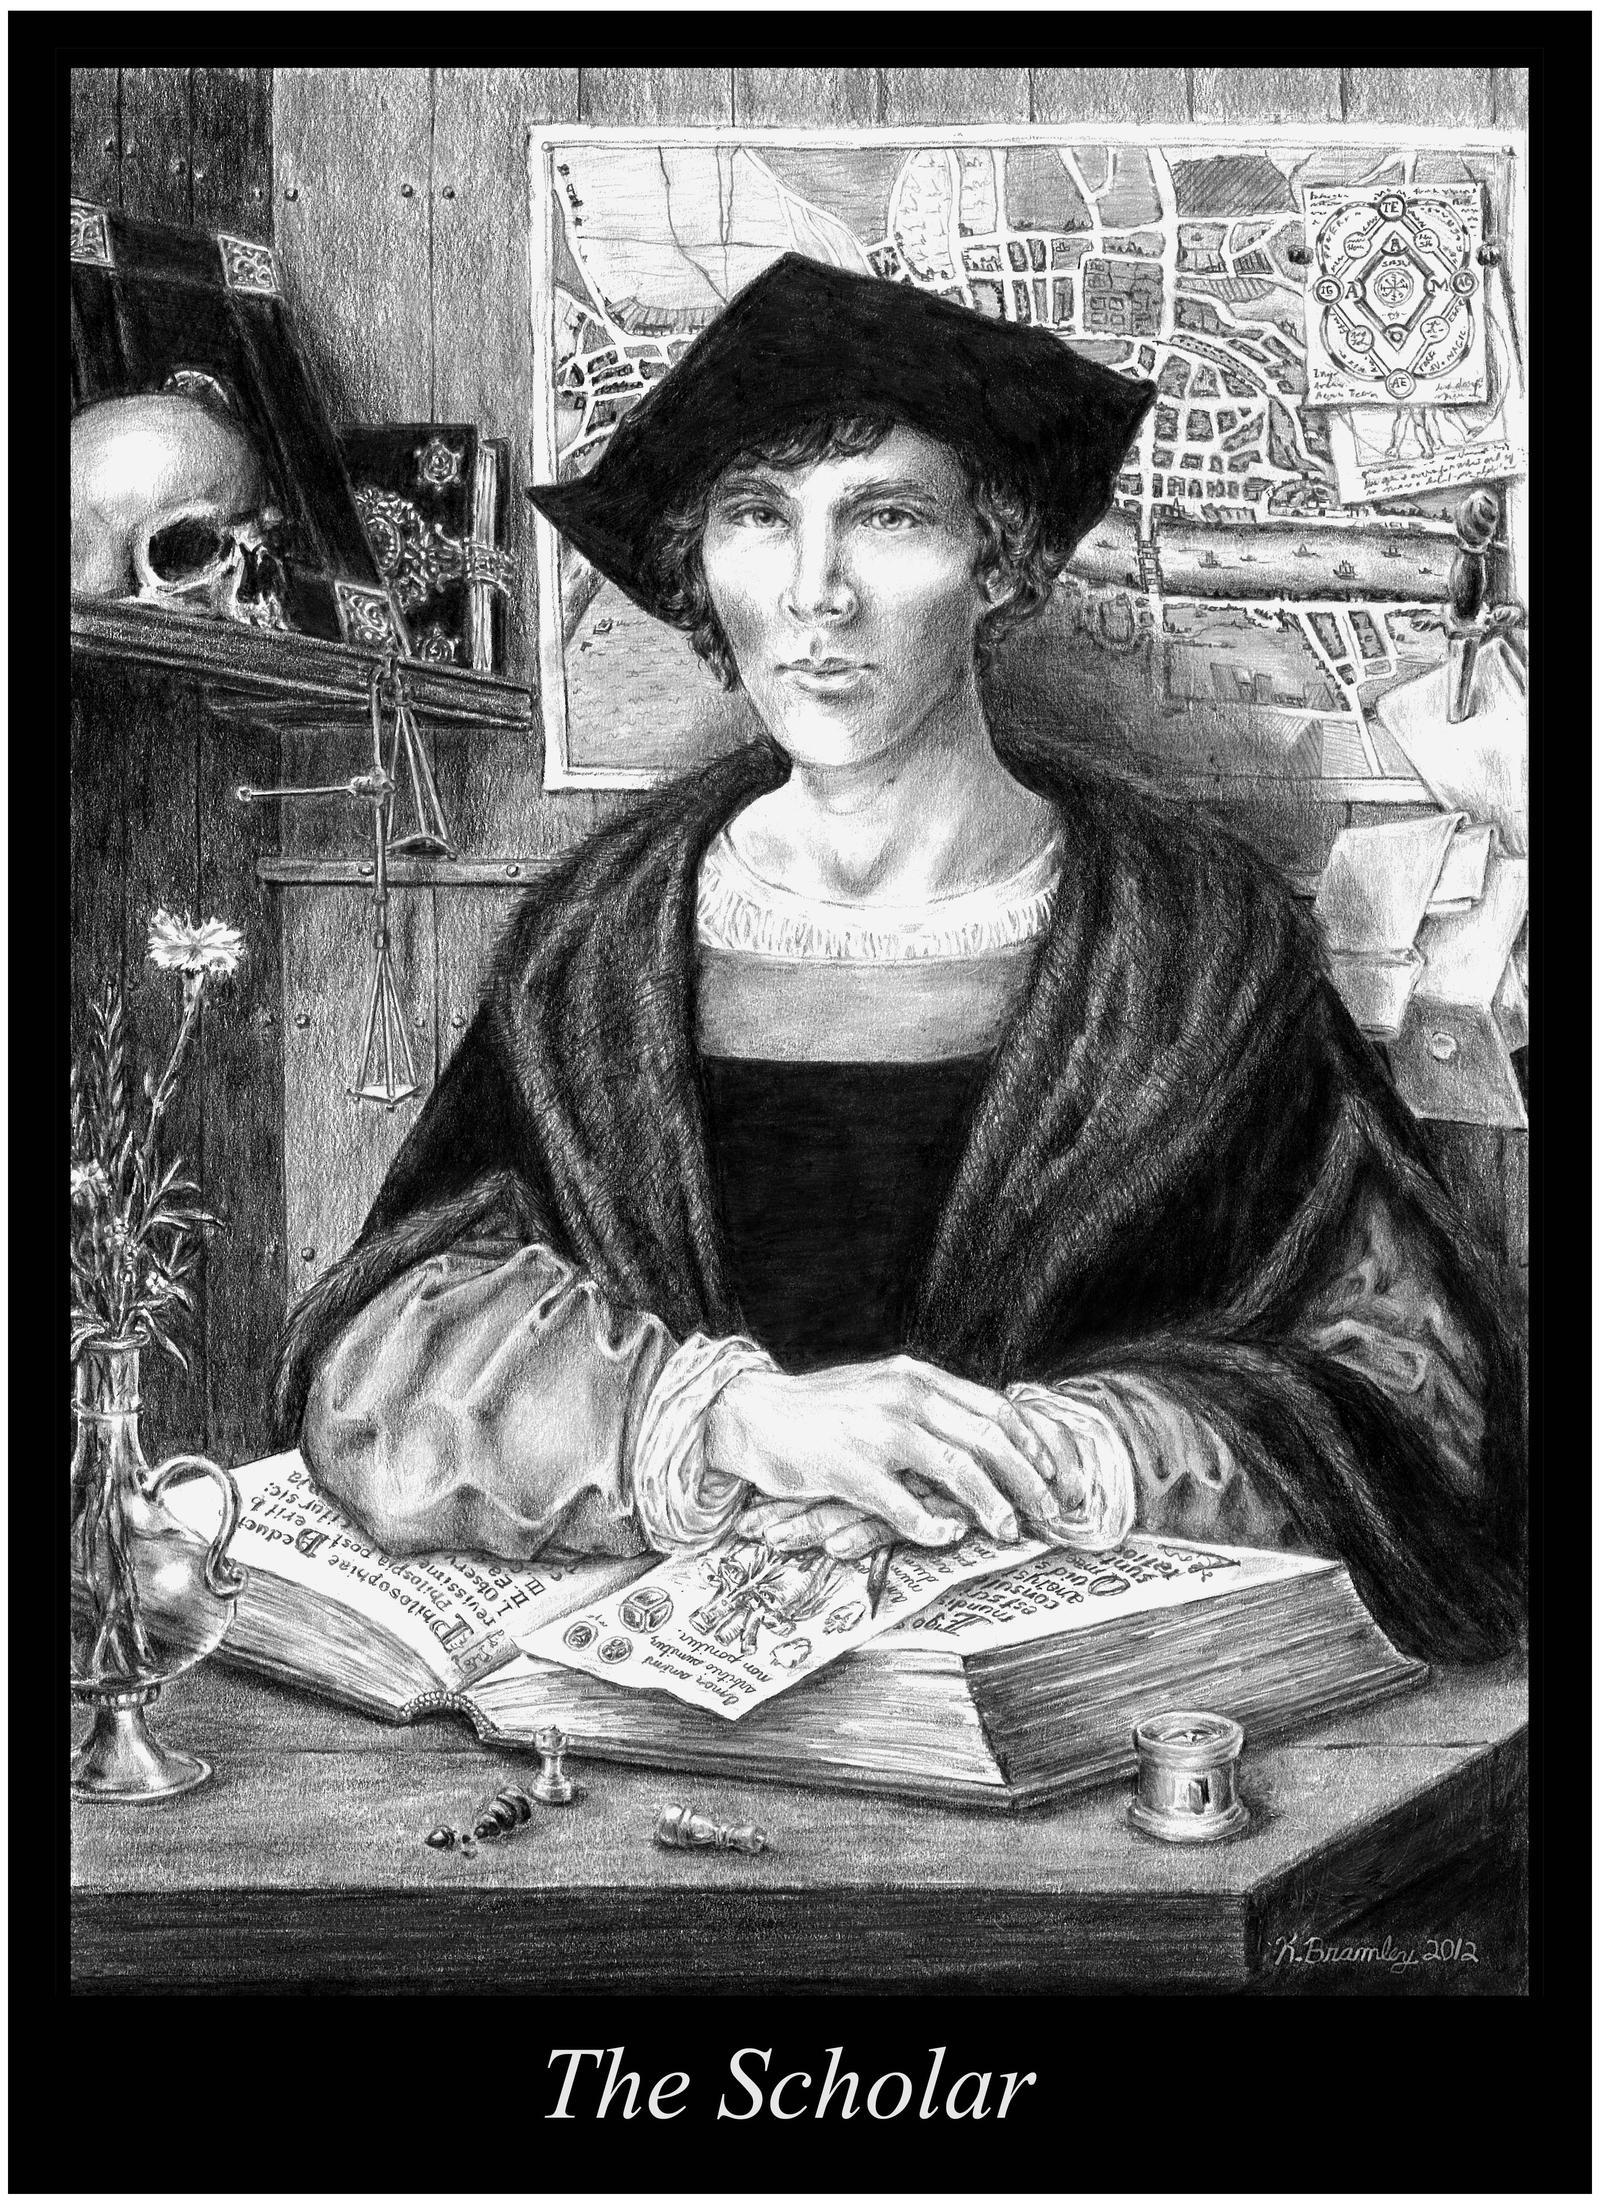 The Scholar by crimsongriffin28